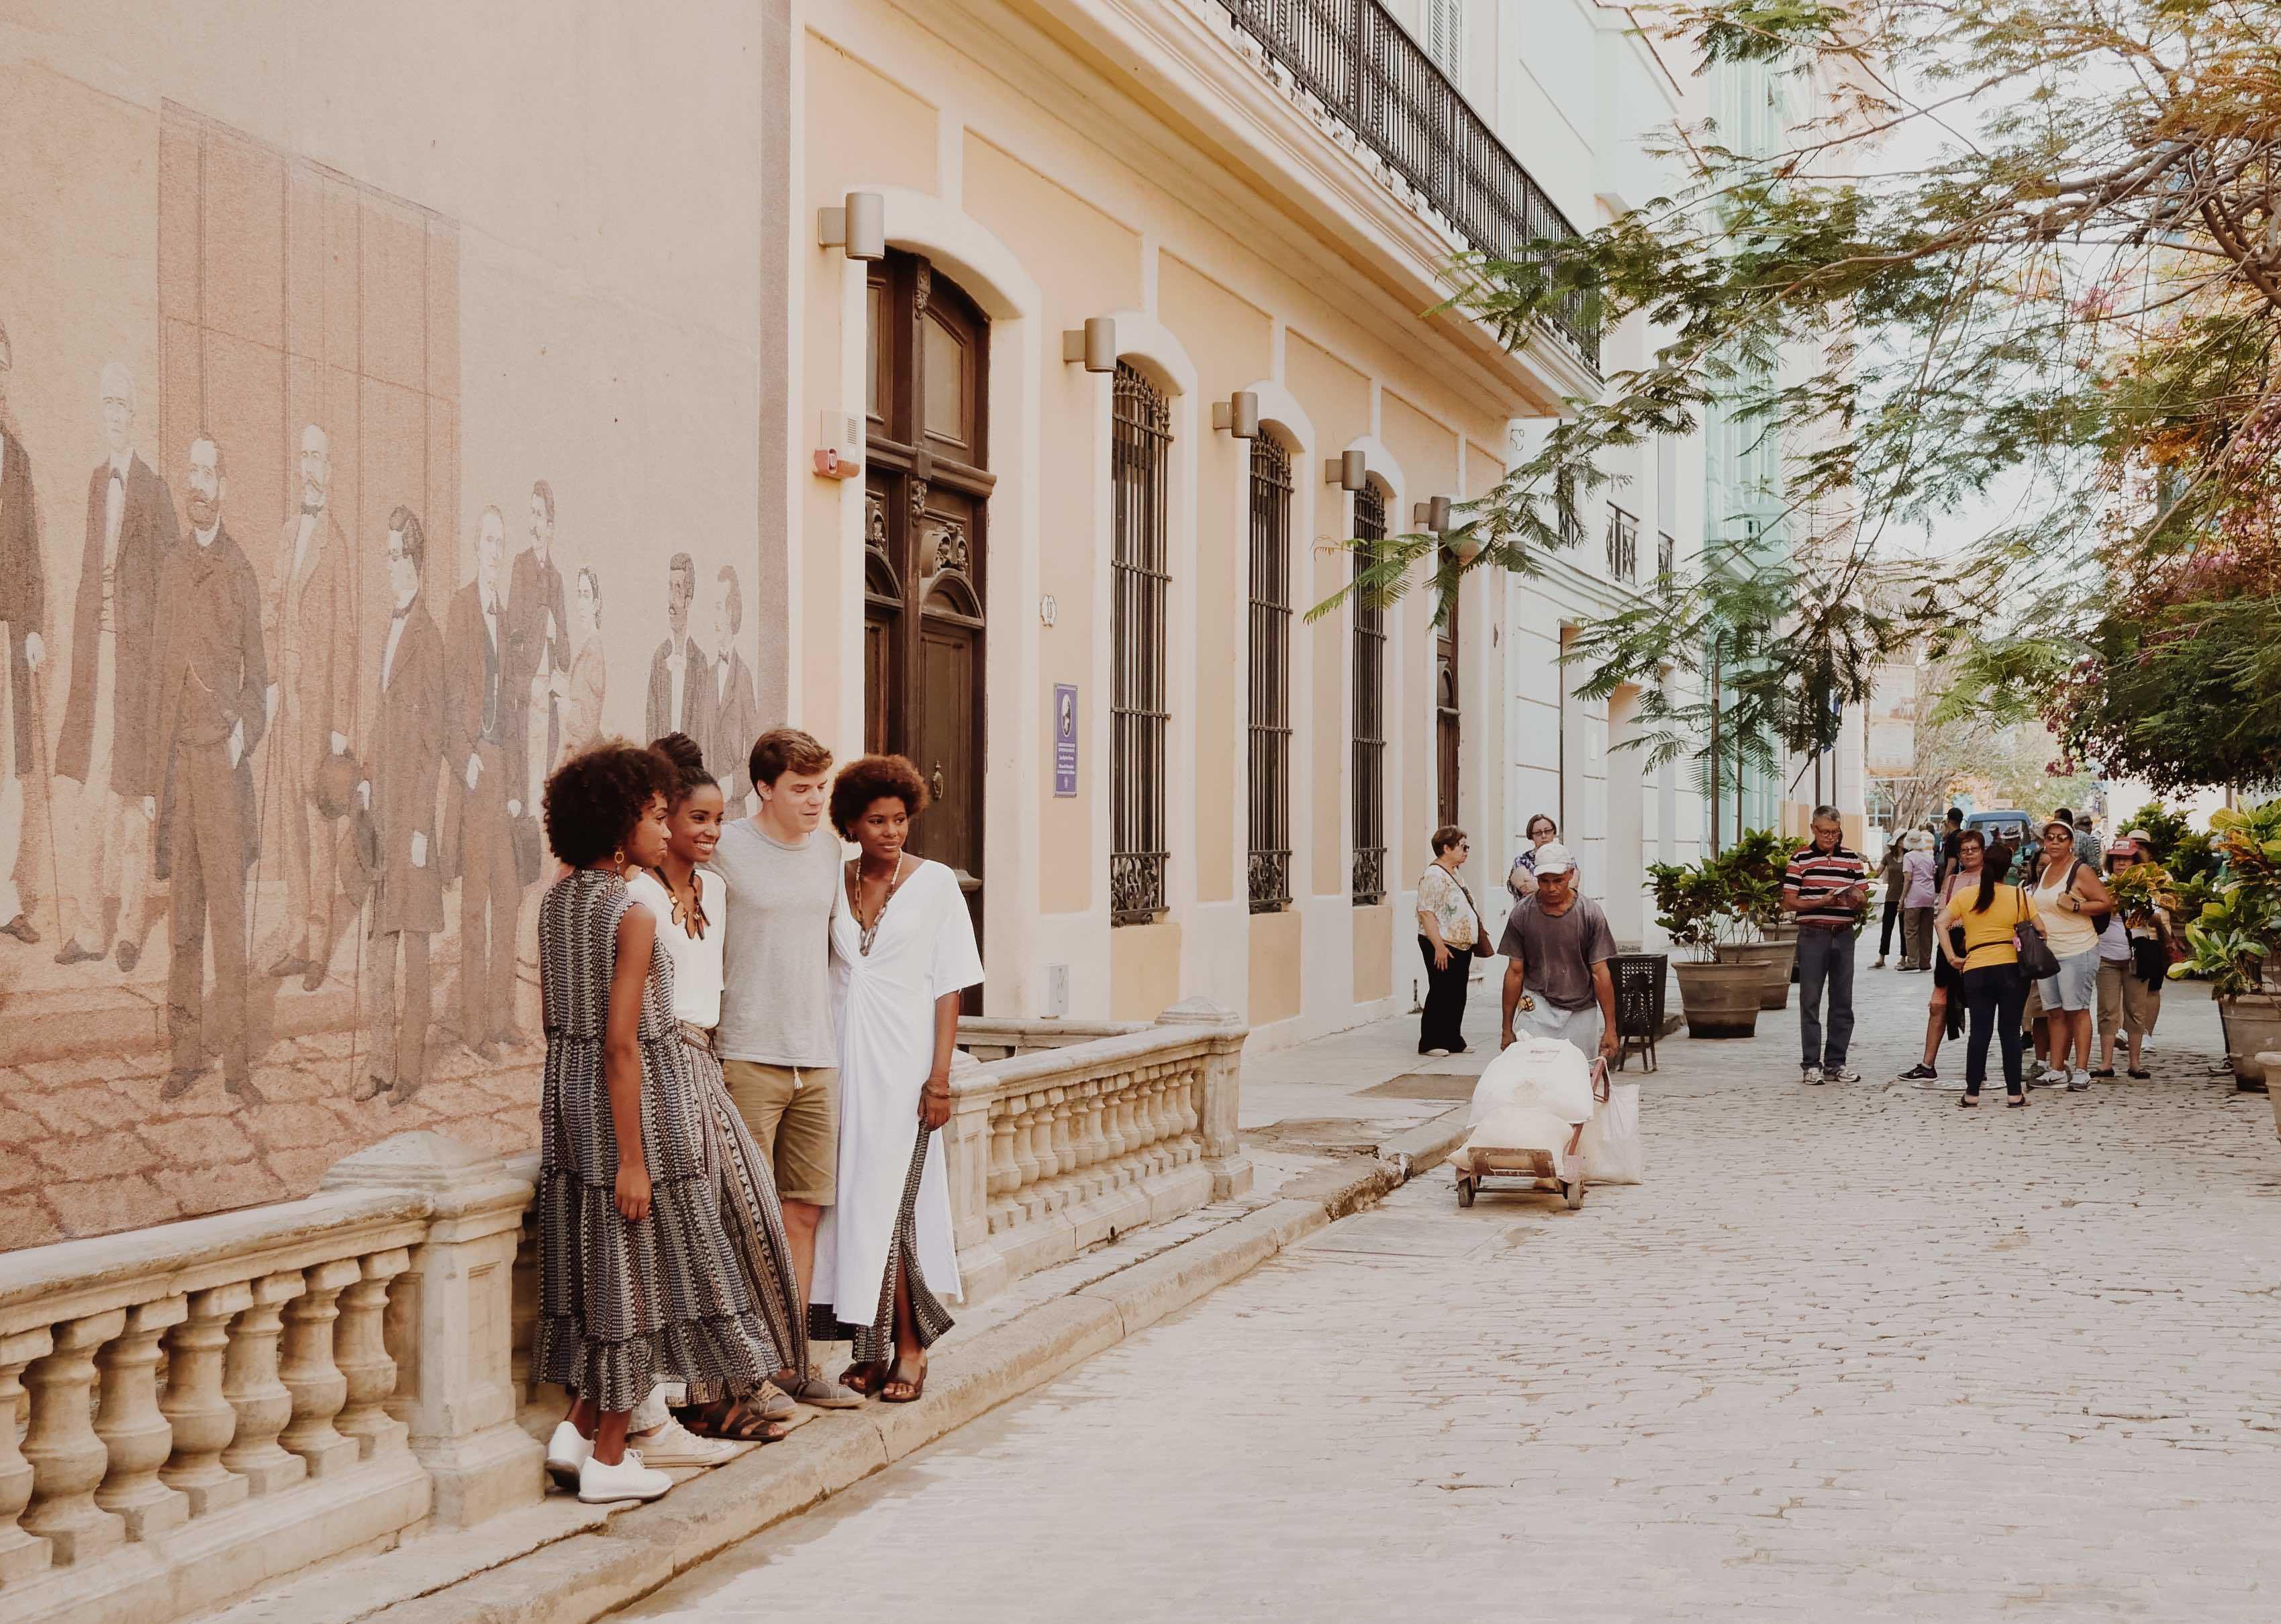 tourism visual storytelling